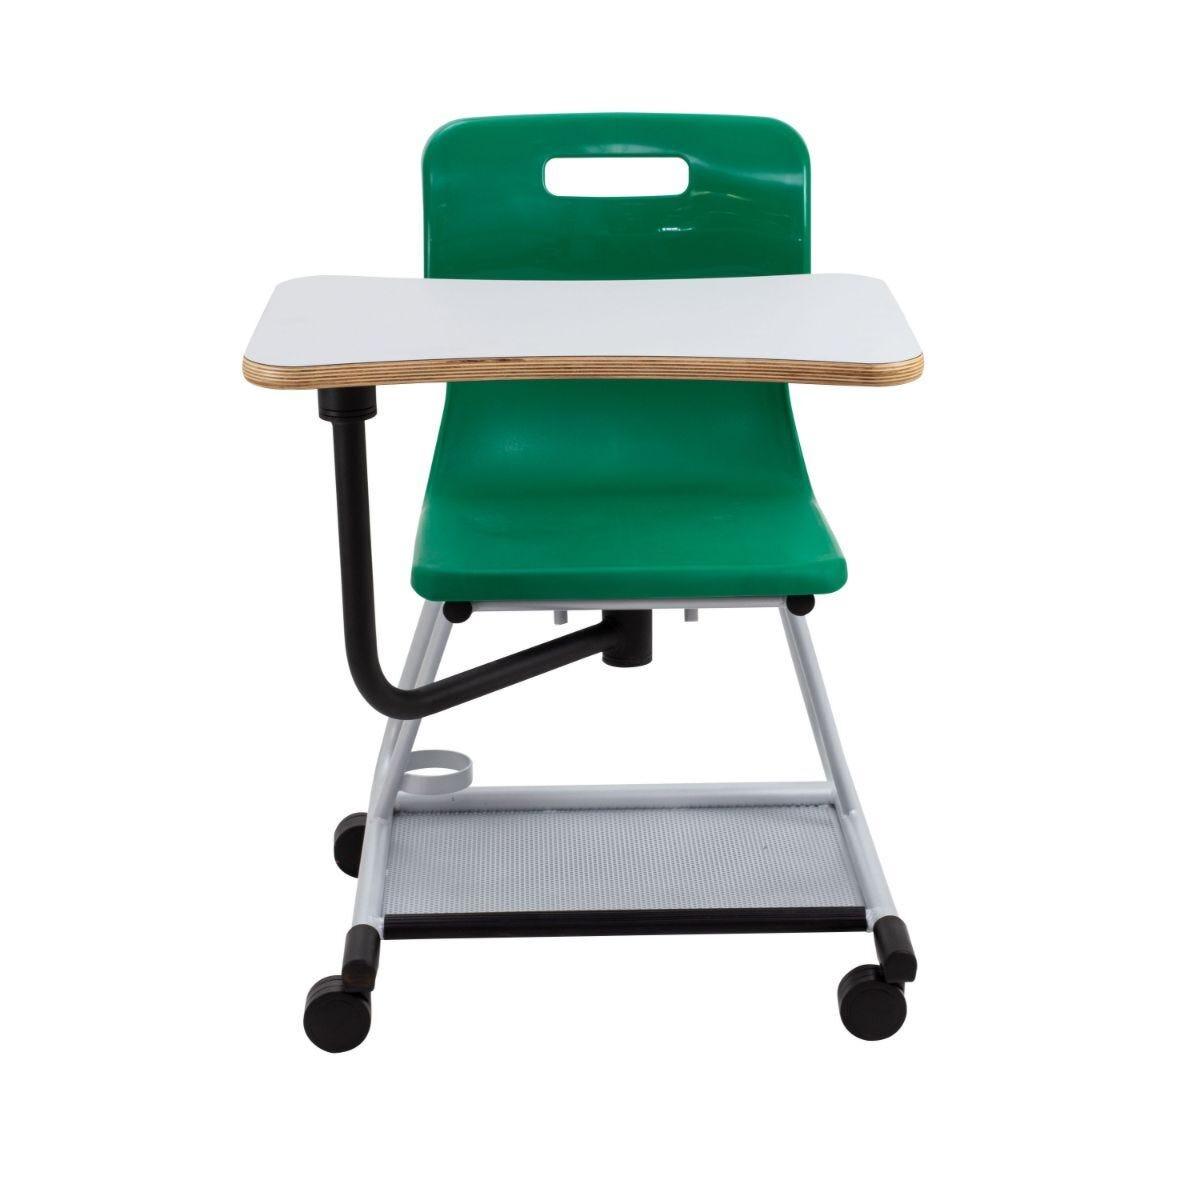 TC Office Titan Teach Chair with Writing Tablet Green